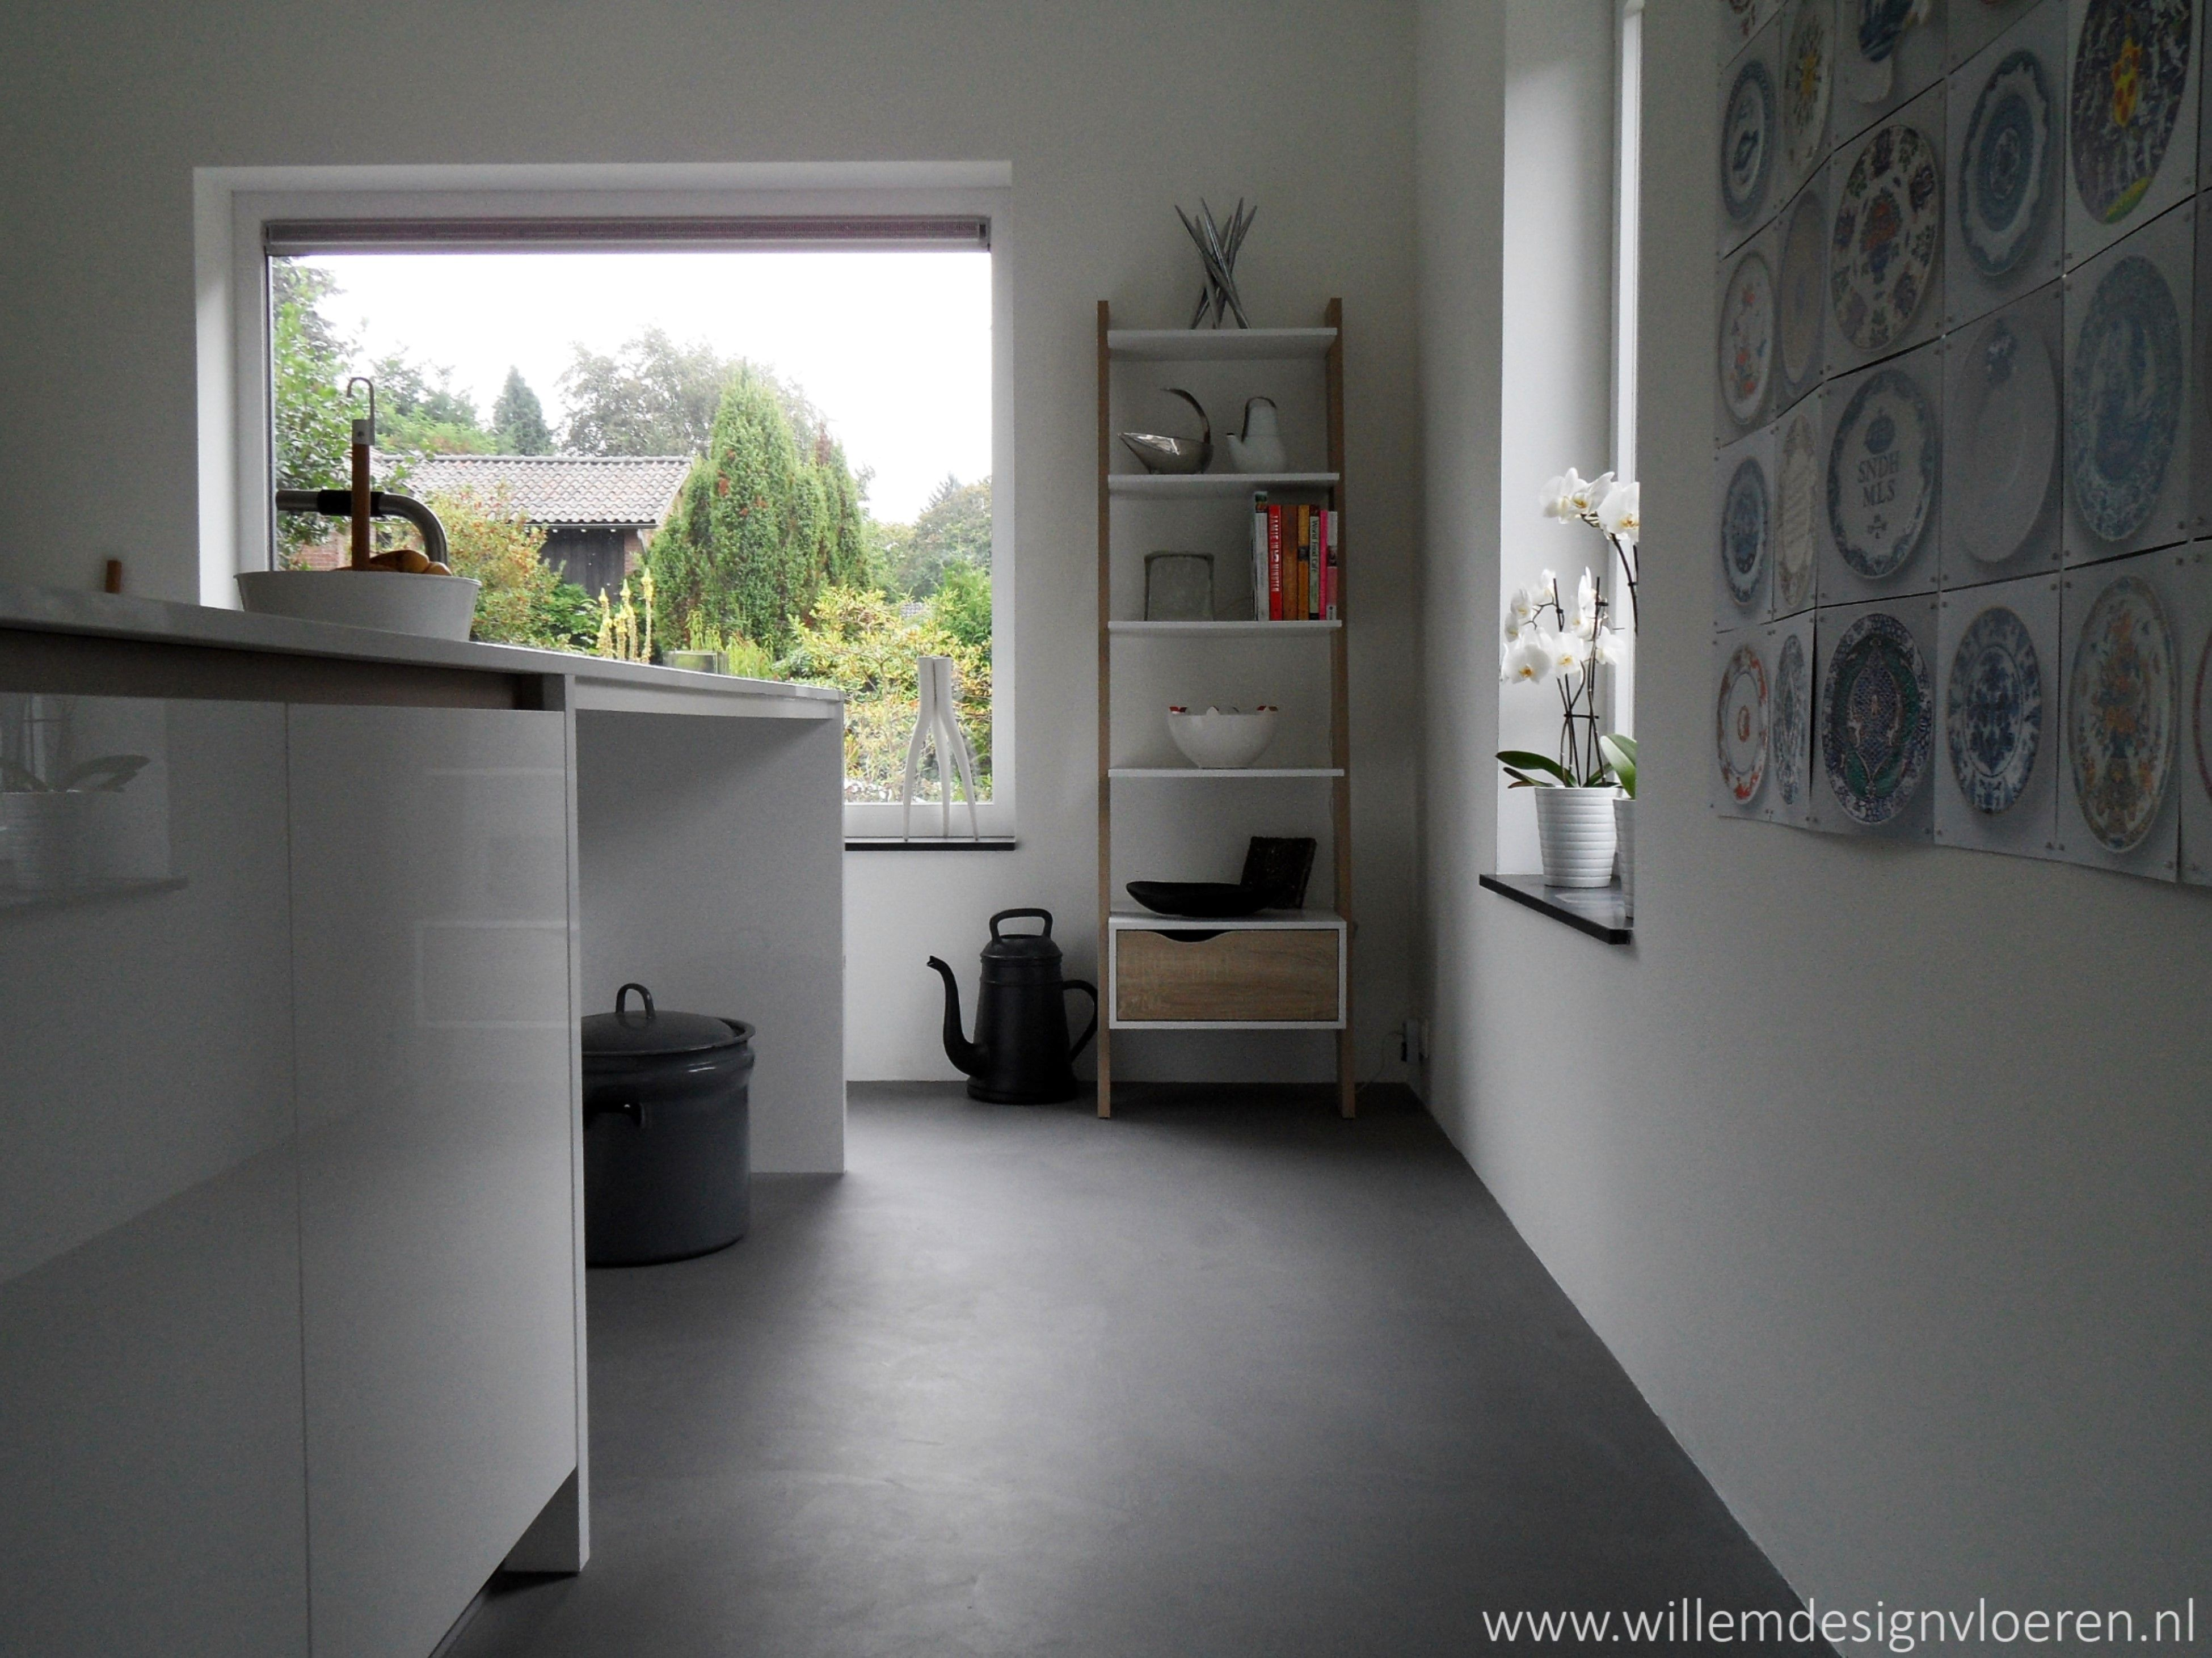 Betonlook vloeren betonlook vloer portfolio beton ciré vloer